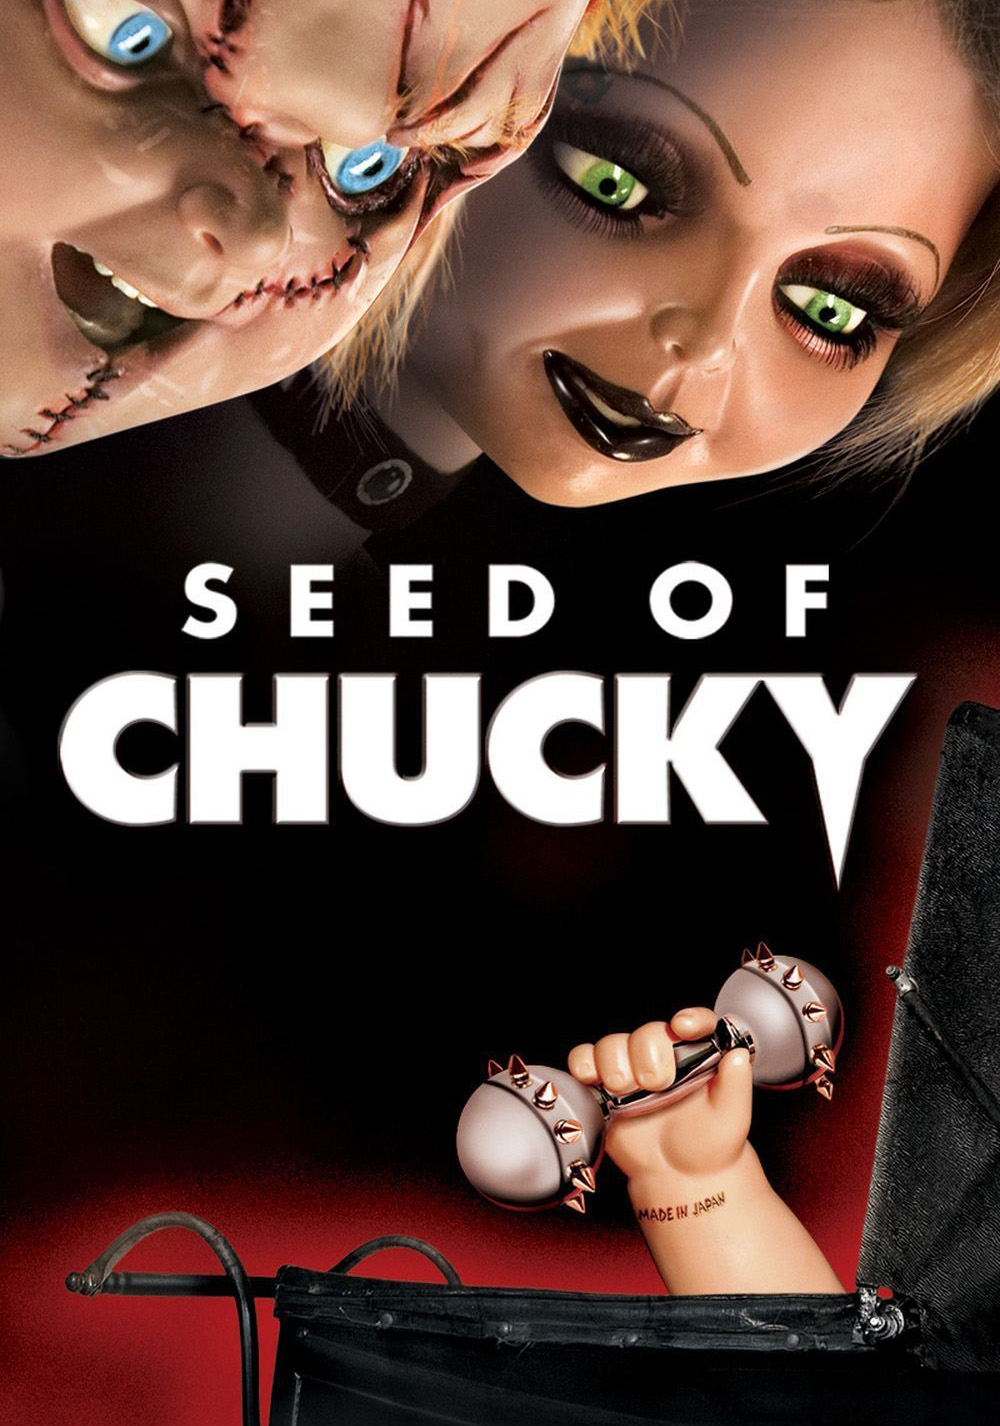 Seed of Chucky | Movie fanart | fanart.tv